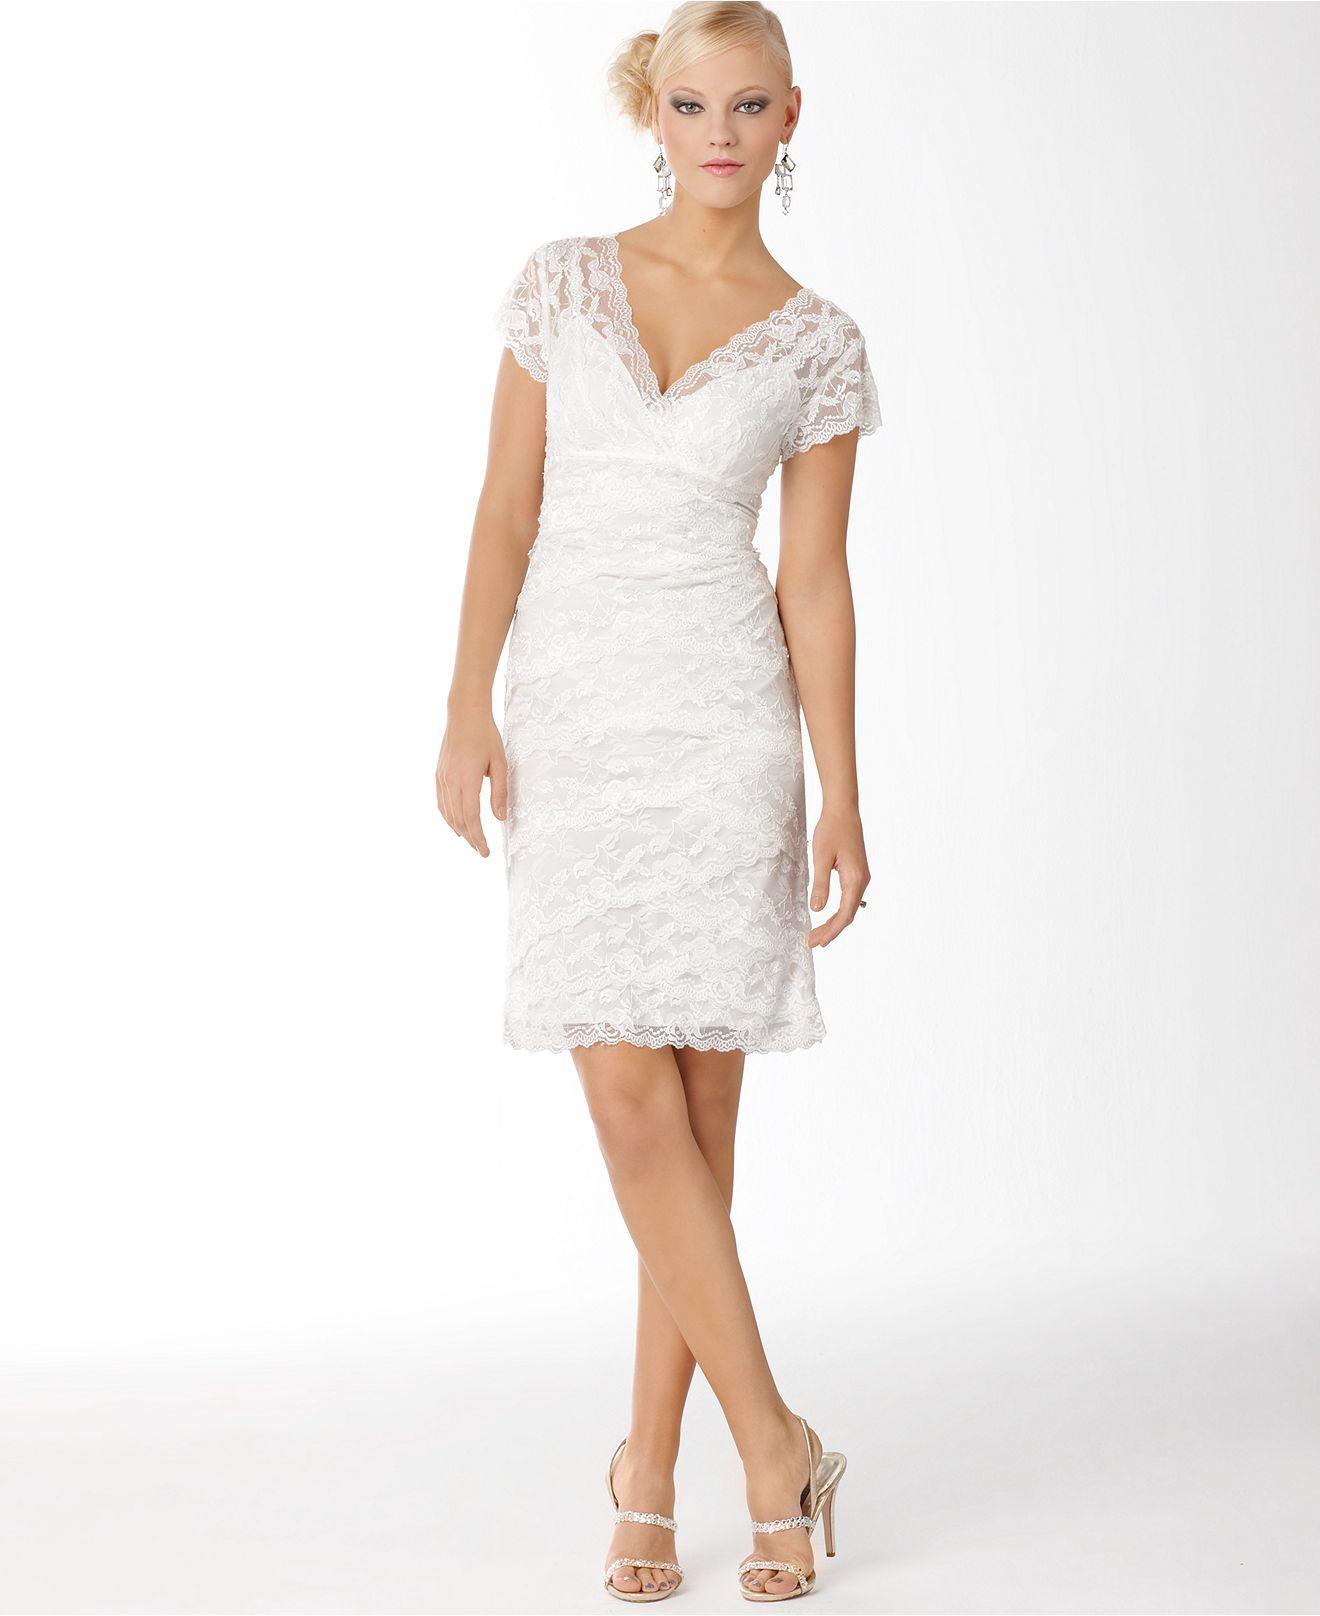 Macy's party dresses weddings  Marina Dress Cap Sleeve Lace Cocktail Dress  Womens Dresses